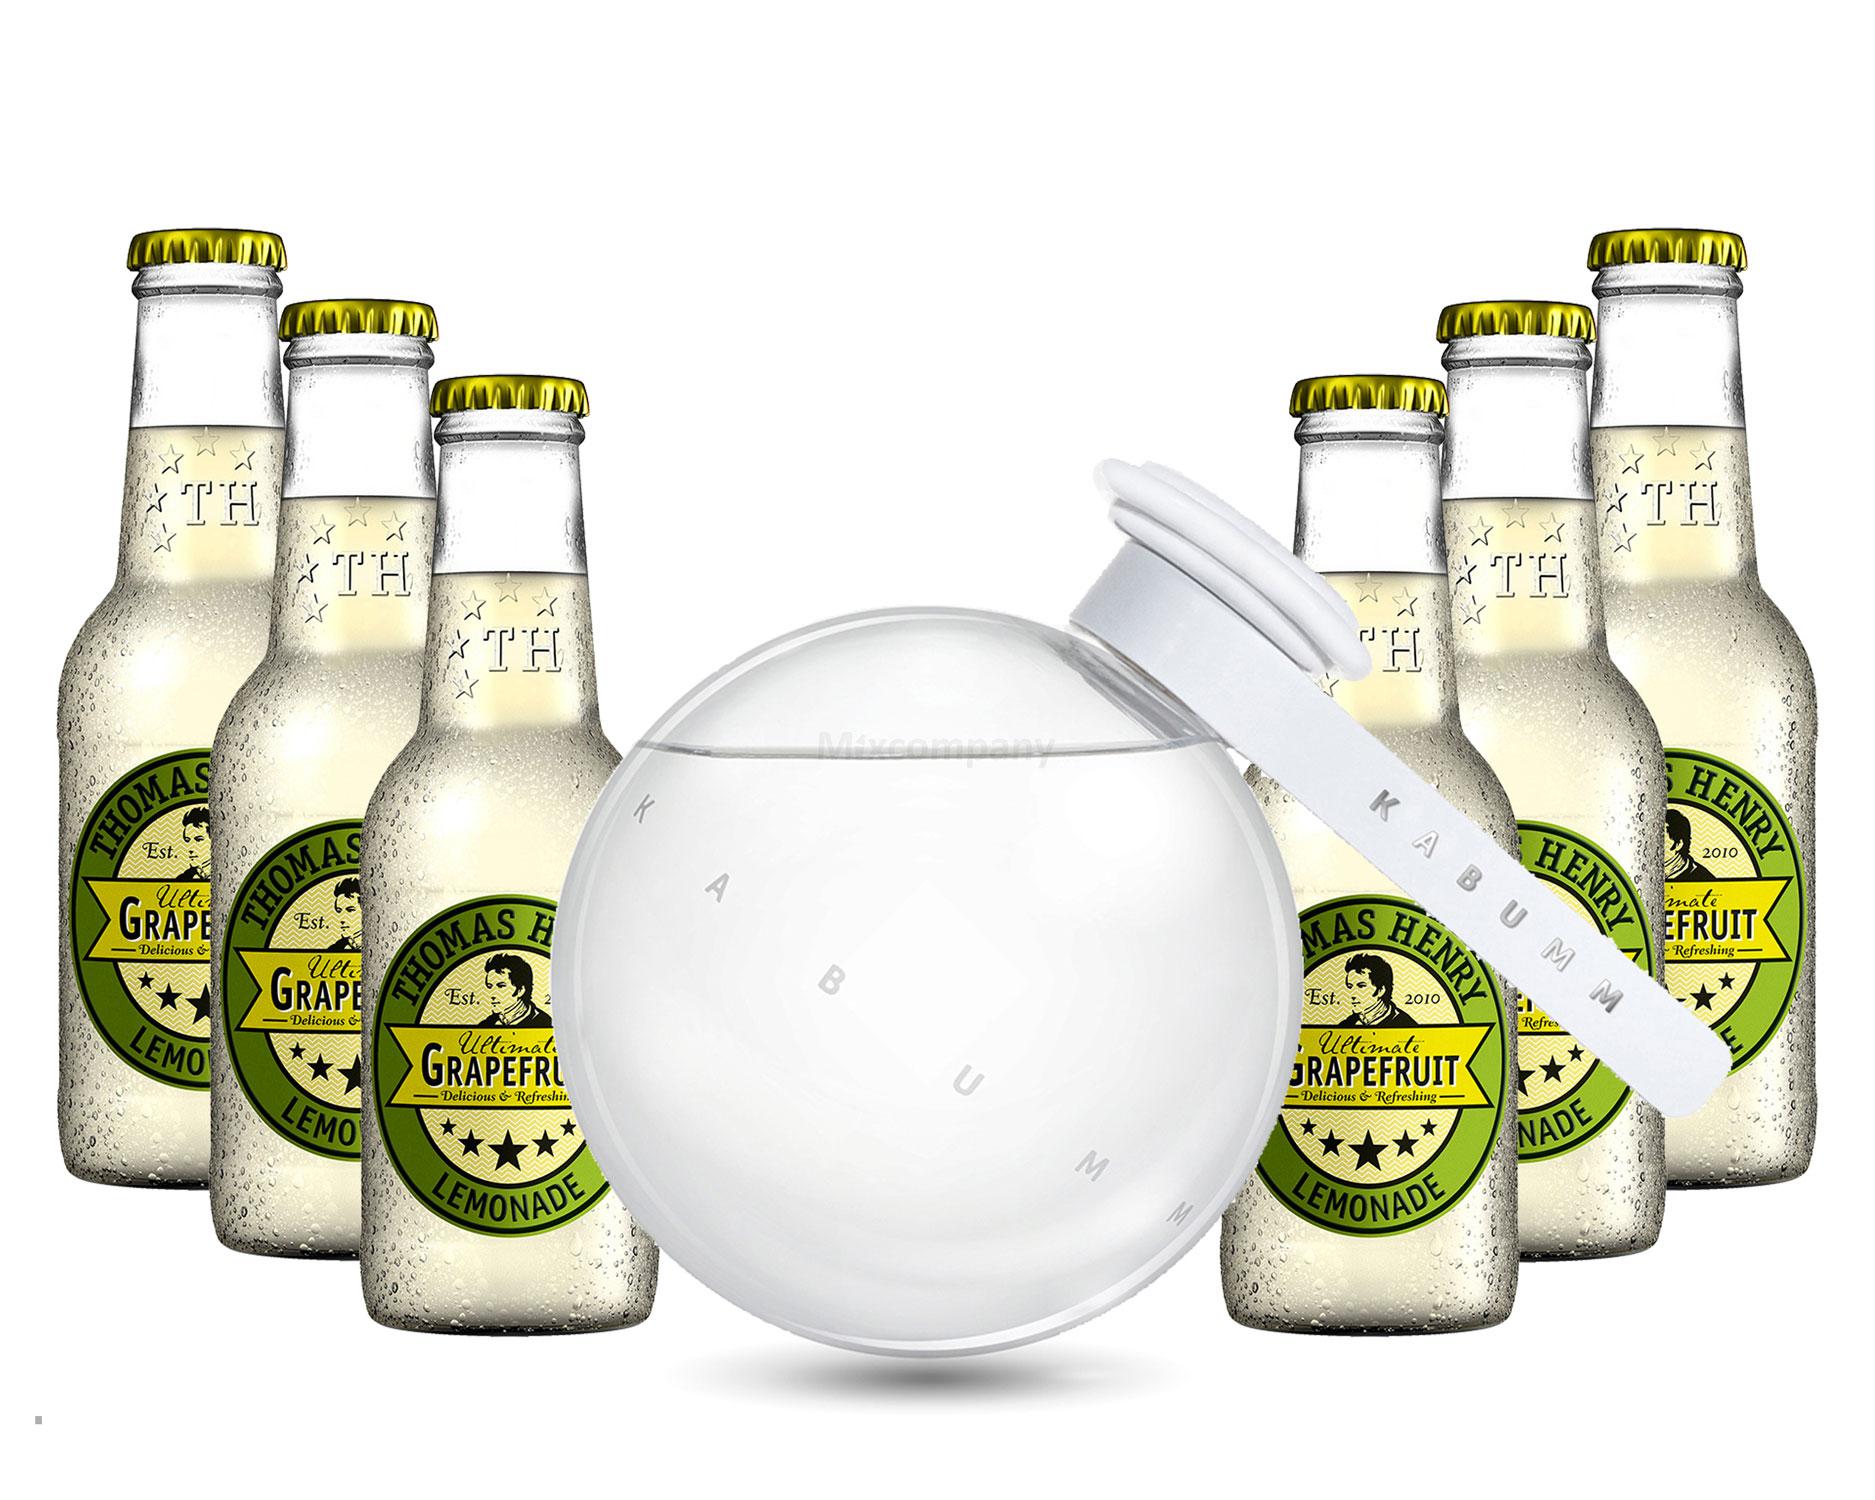 Vodka Lemon Set - Kabumm Vodka 0,7l 700ml (40% Vol) + 6x Thomas Henry Grapefruit Lemonade 200ml - Inkl. Pfand MEHRWEG